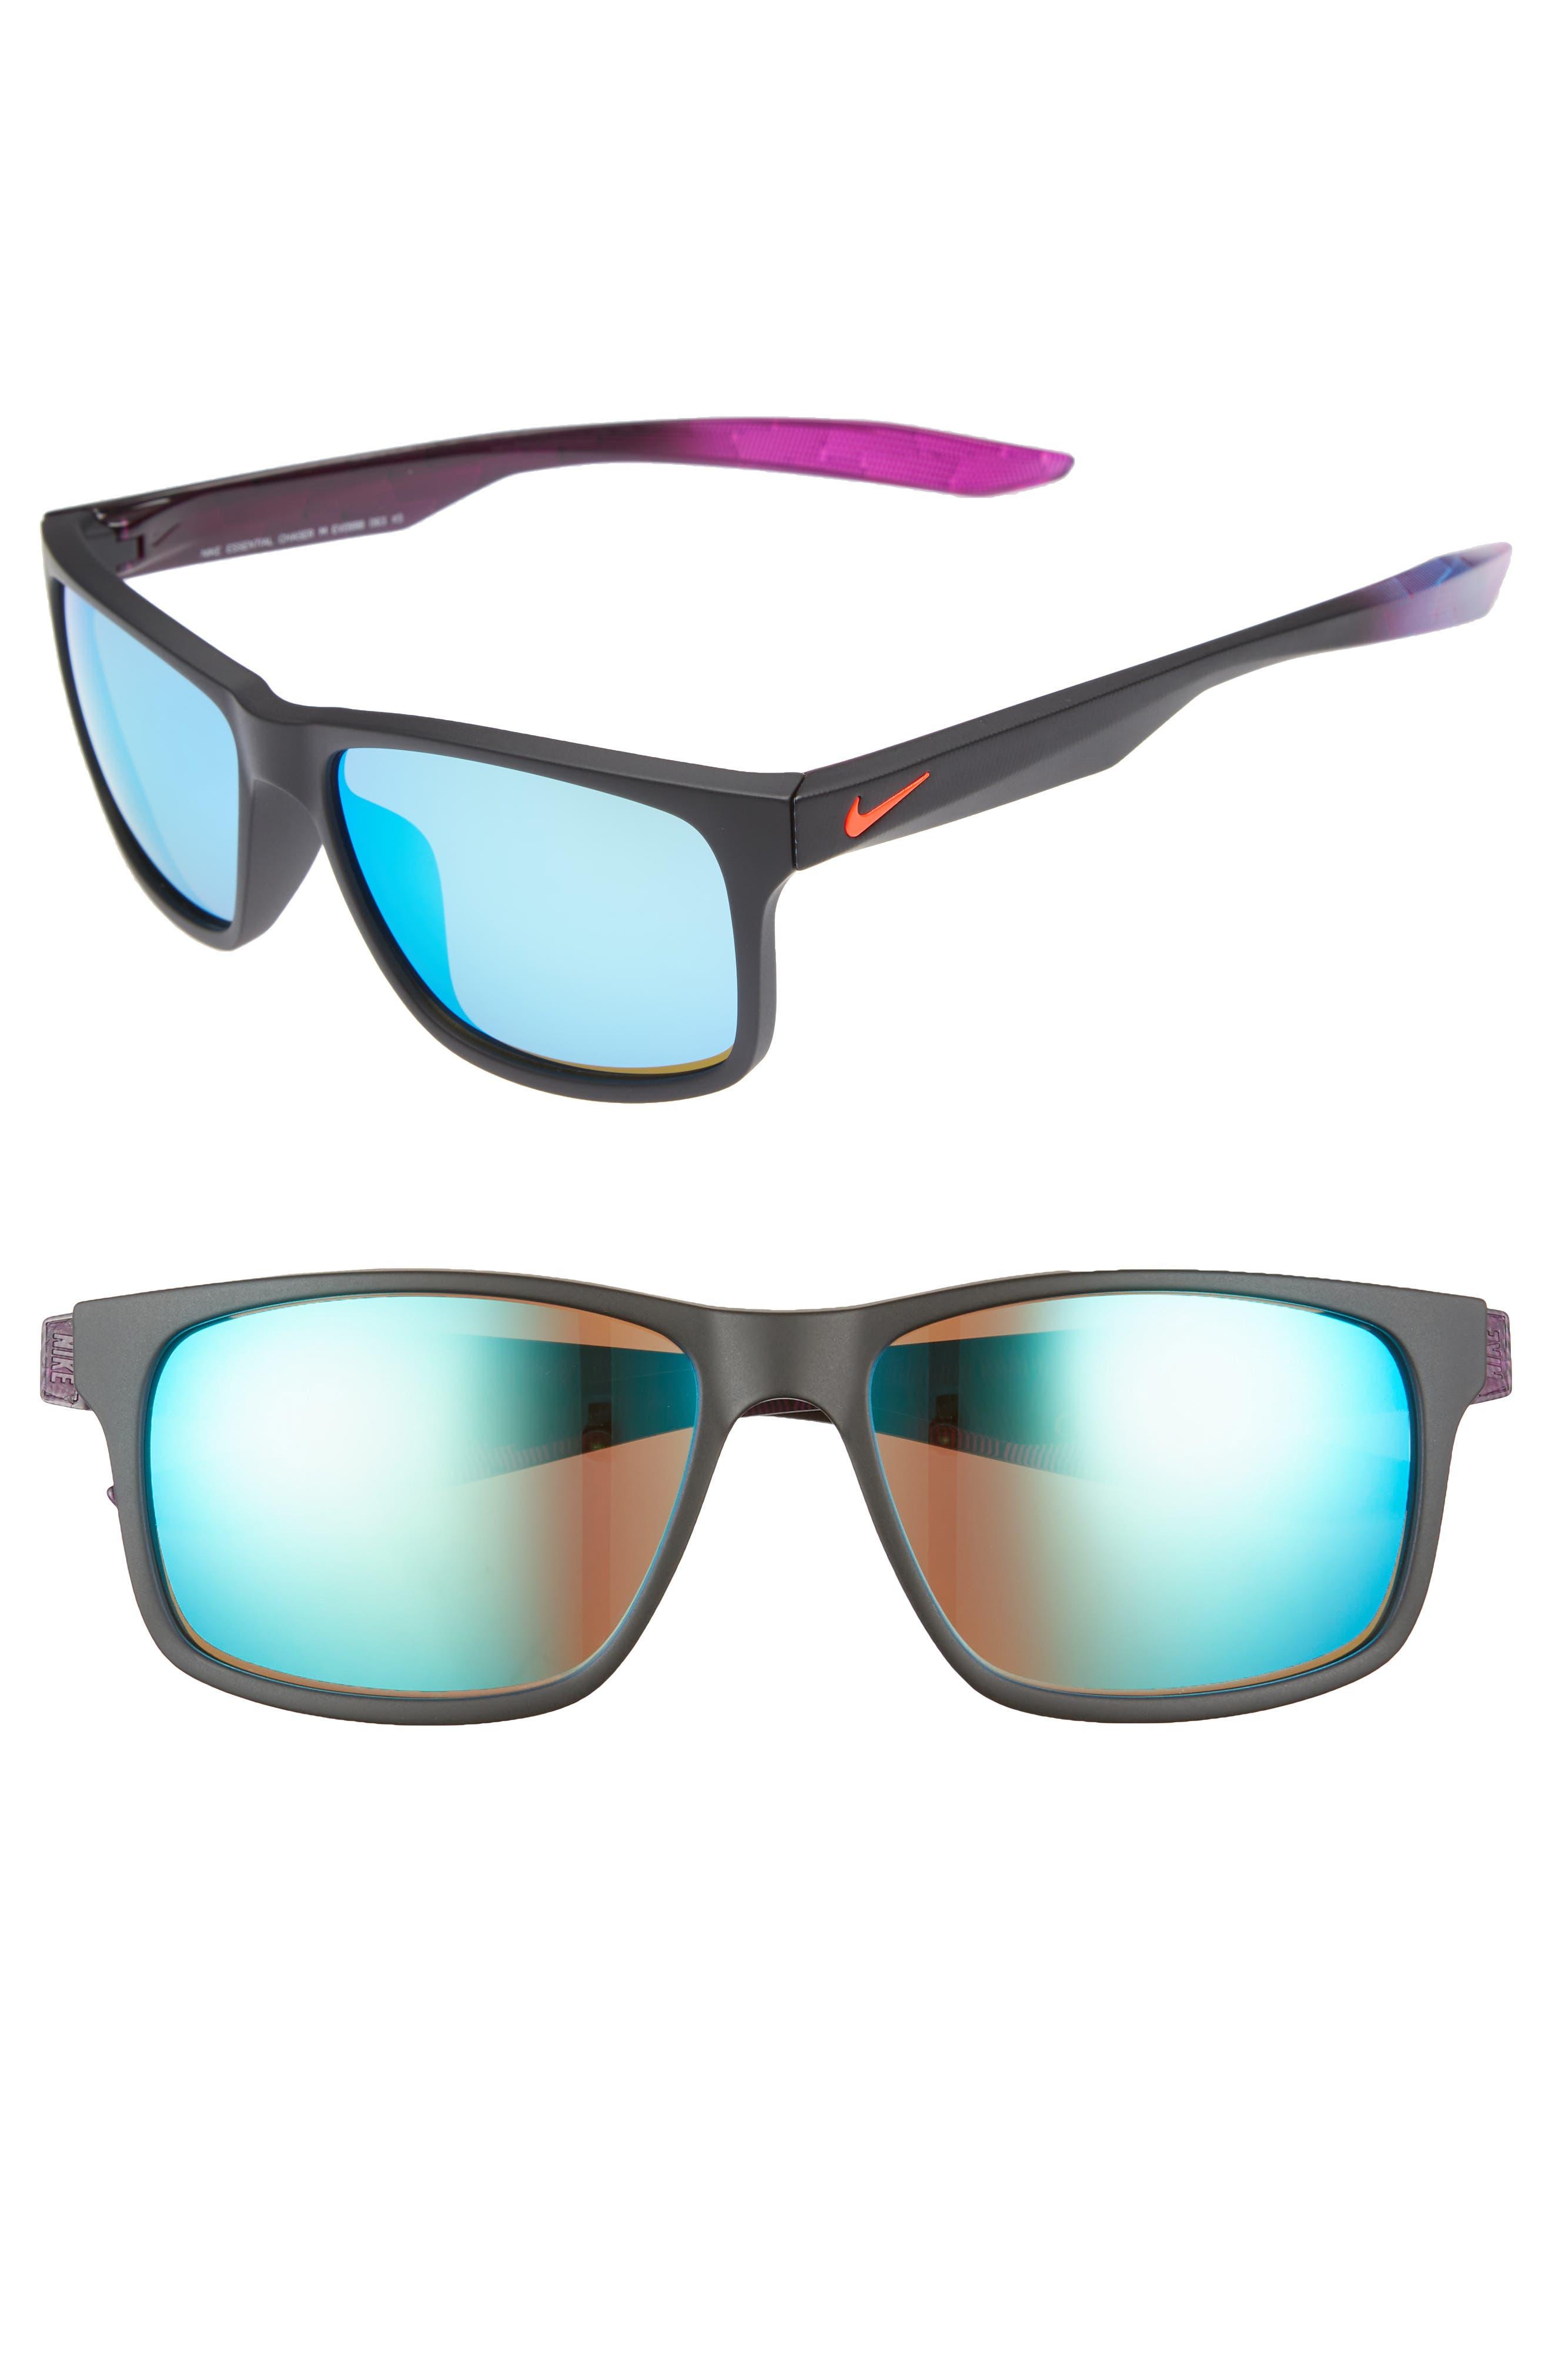 cdf3bd9cfa15 Nike Essential Chaser 57Mm Reflective Sunglasses - Matte Black/ Green